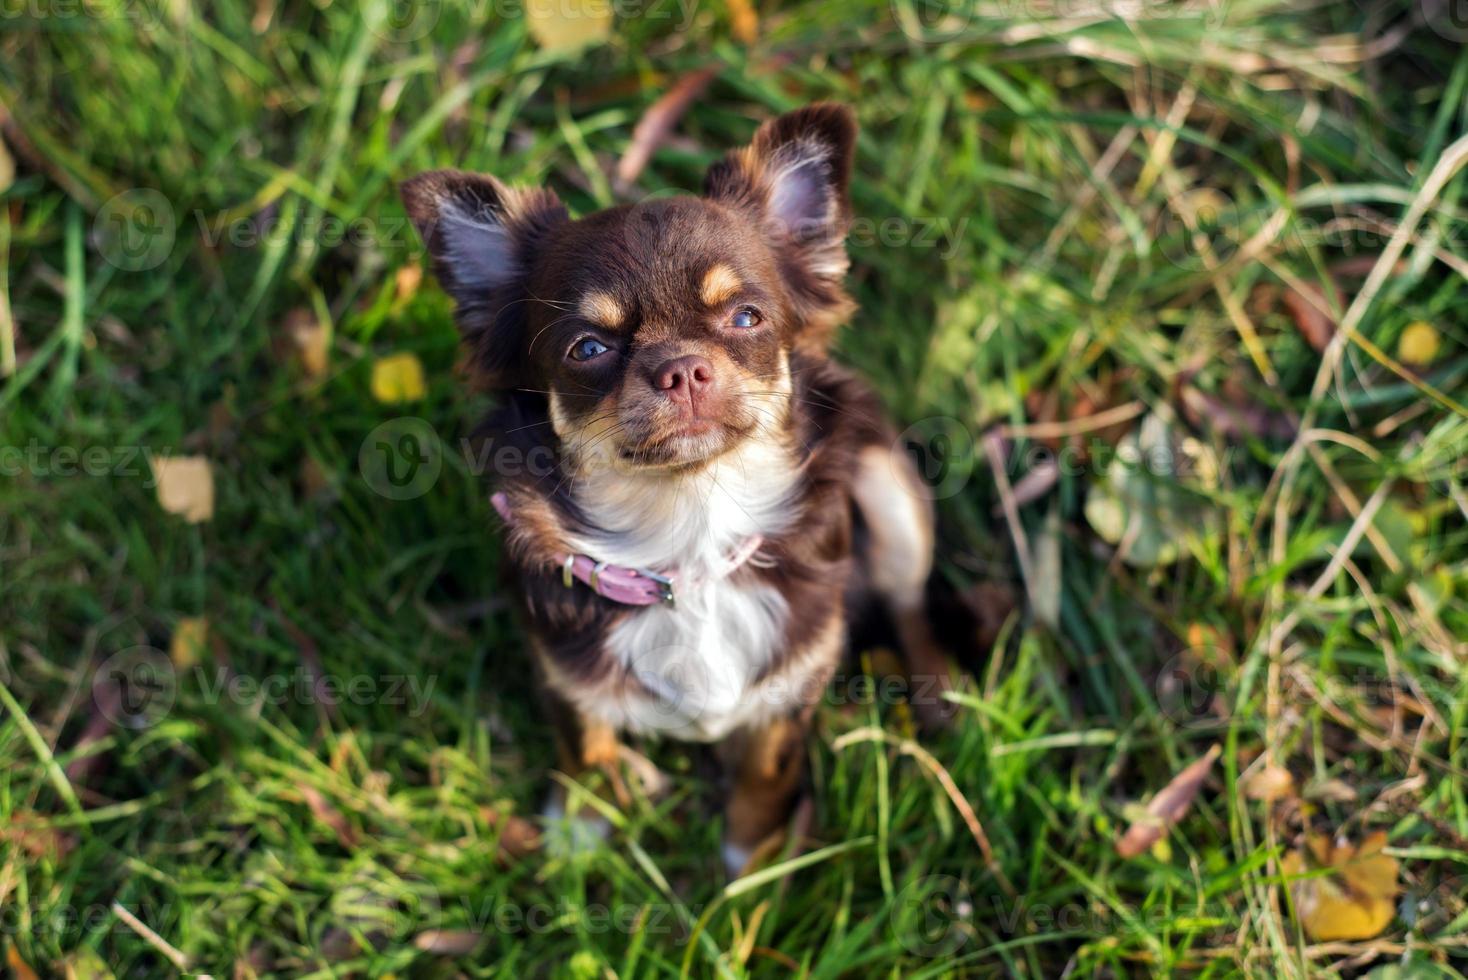 cachorro chihuahua, olhando para cima foto